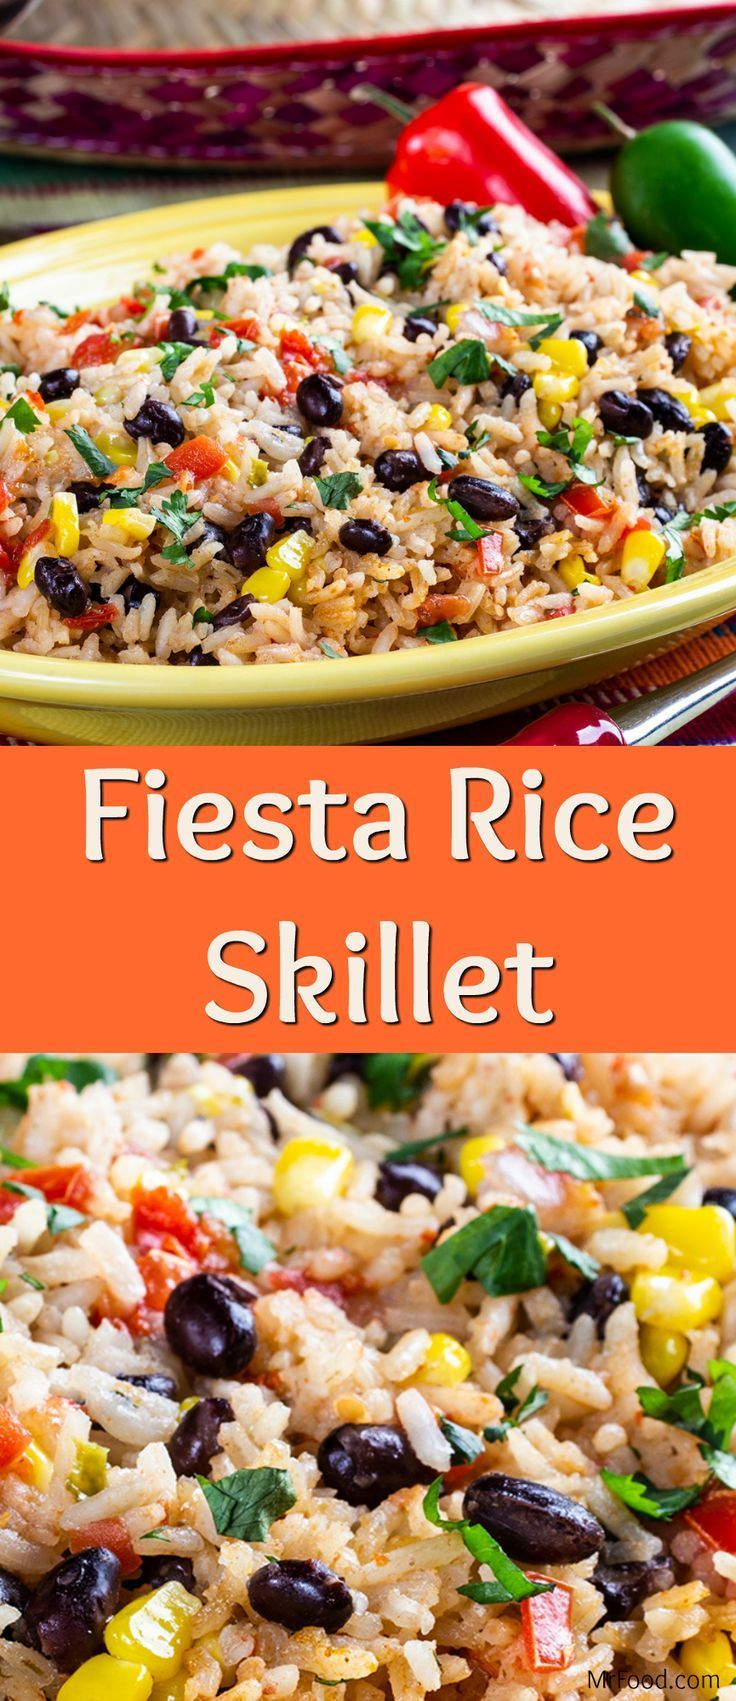 Fiesta Rice Skillet images